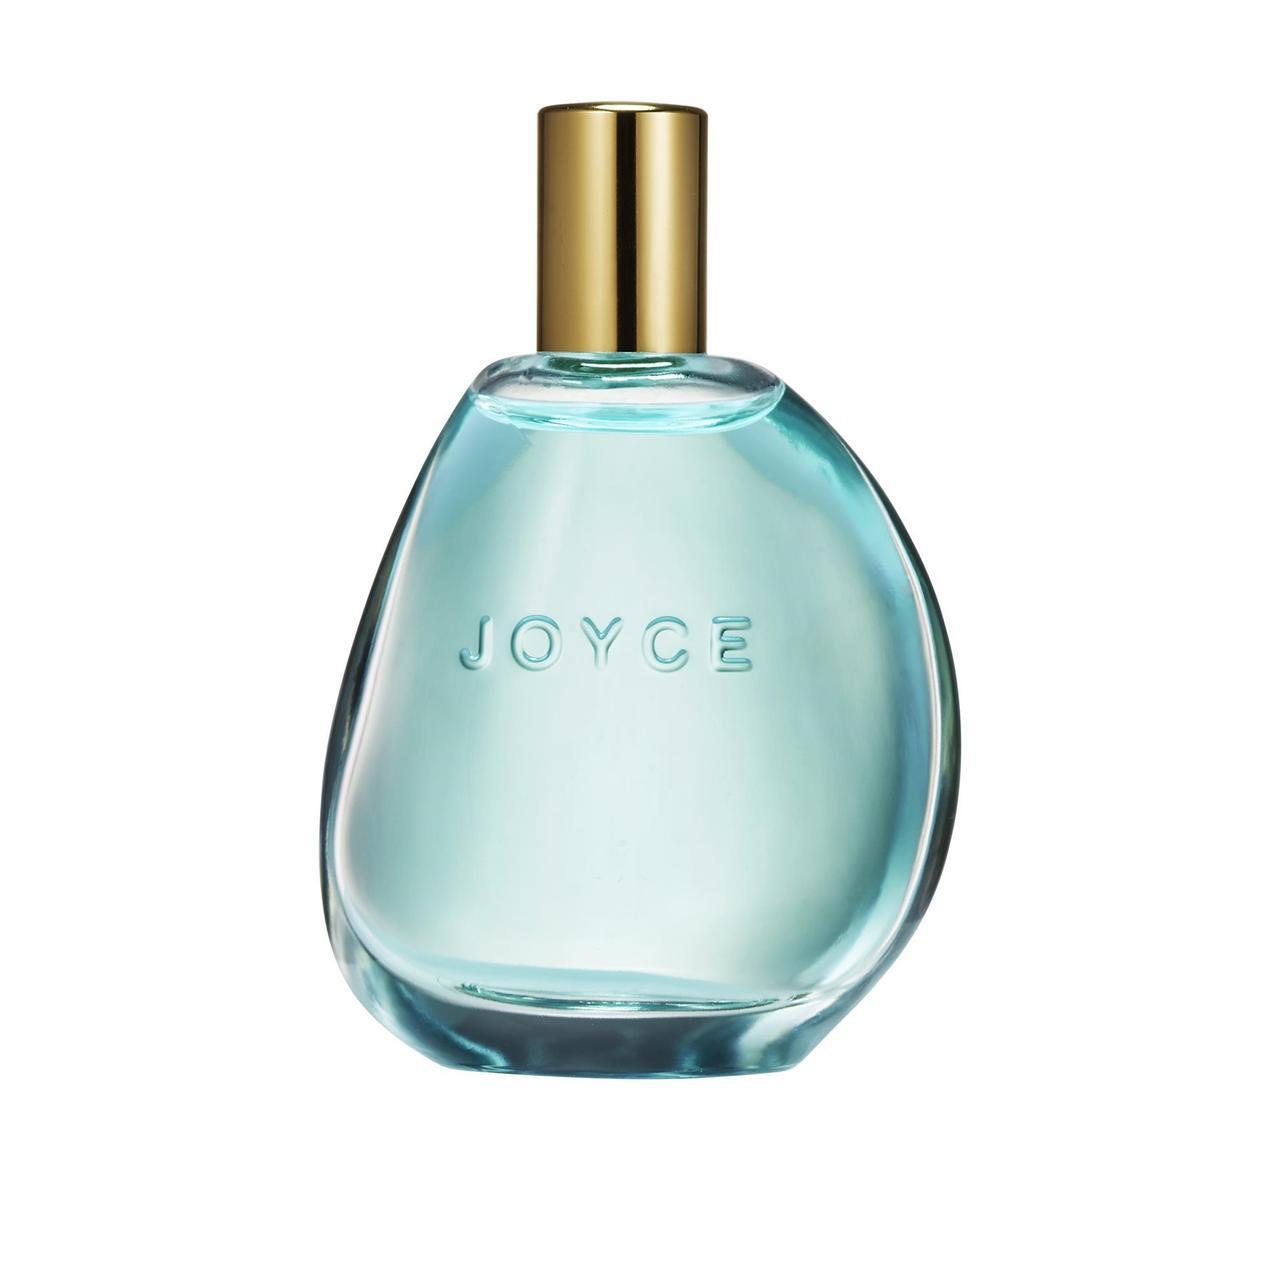 Туалетная вода Joyce Turquoise Oriflame